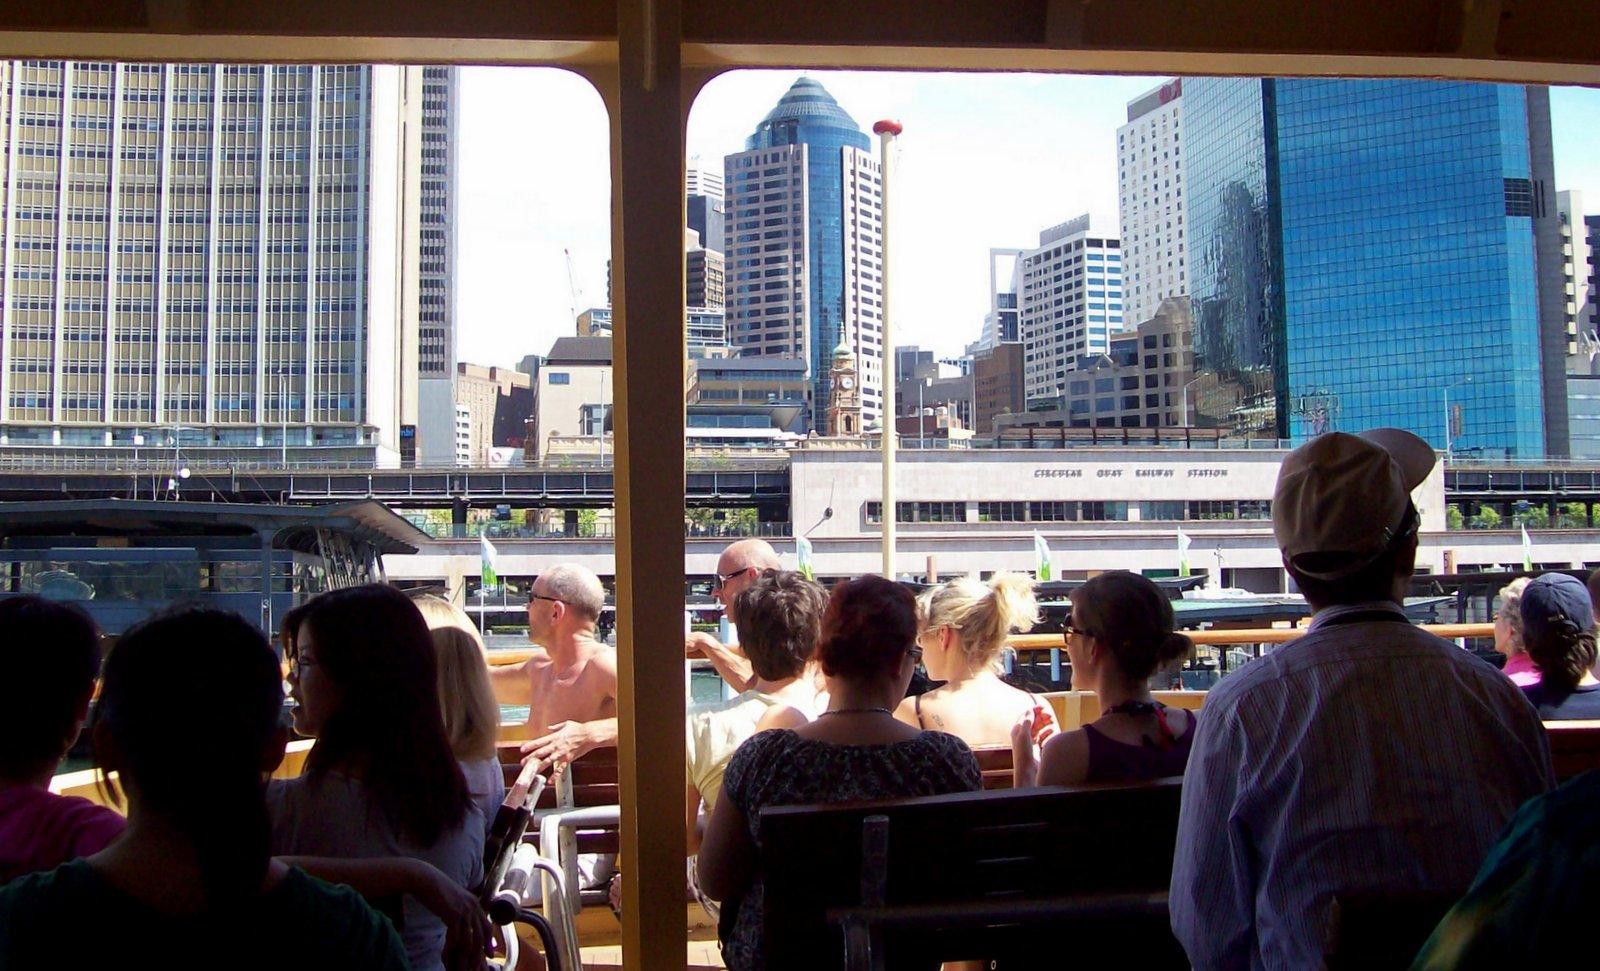 Am Circular Quay Sydney